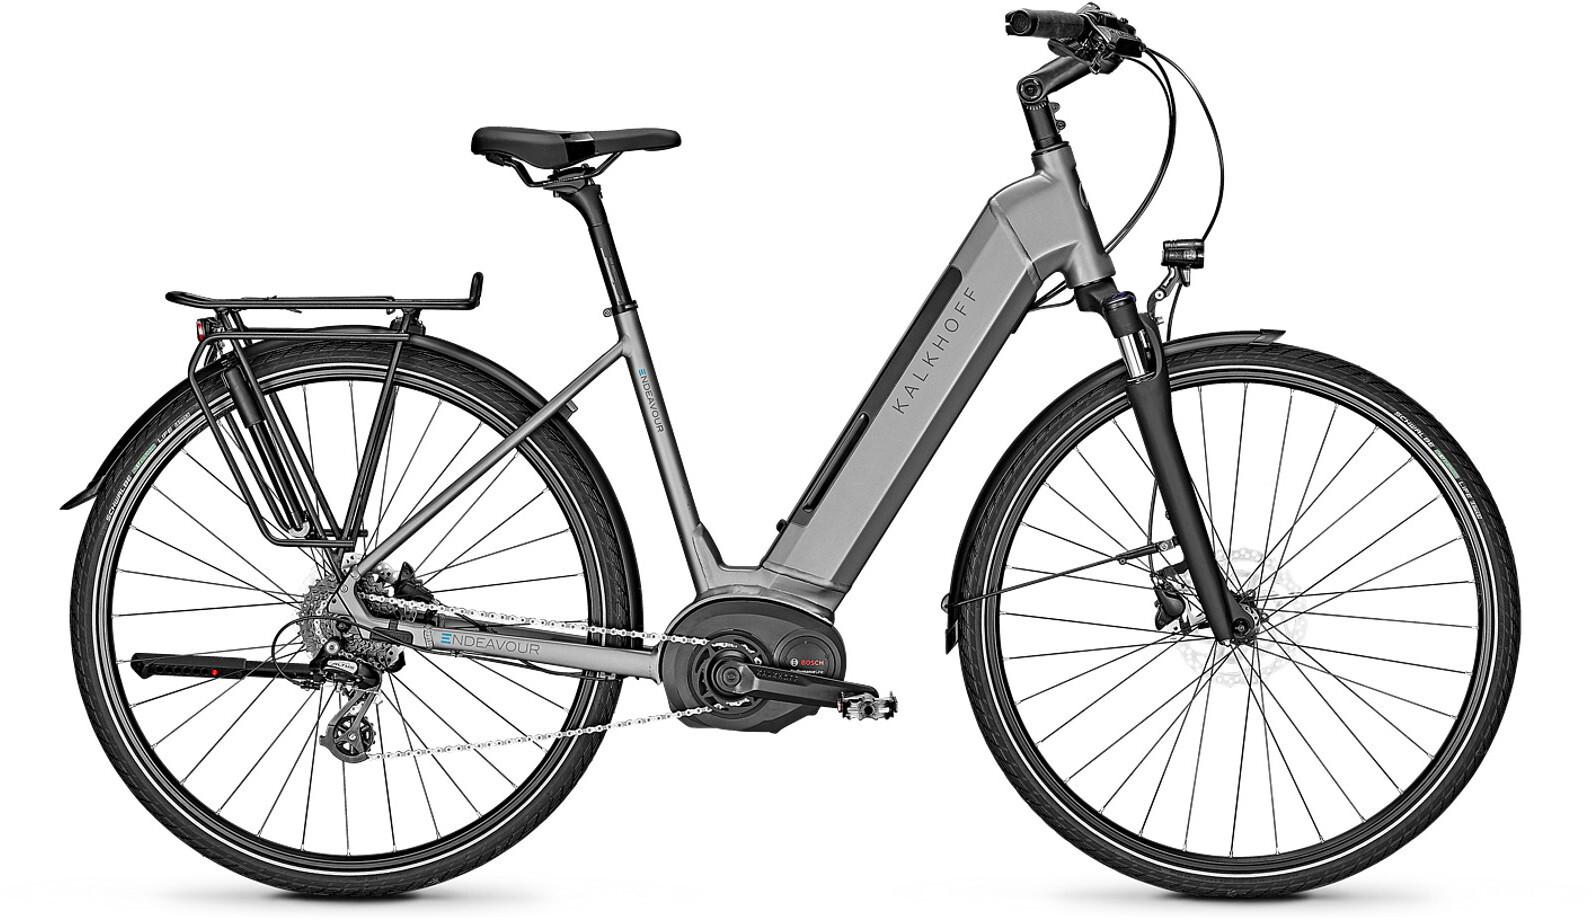 Kalkhoff Endeavour 3.B Move E-citybike Wave 500Wh grå (2019) | City-cykler